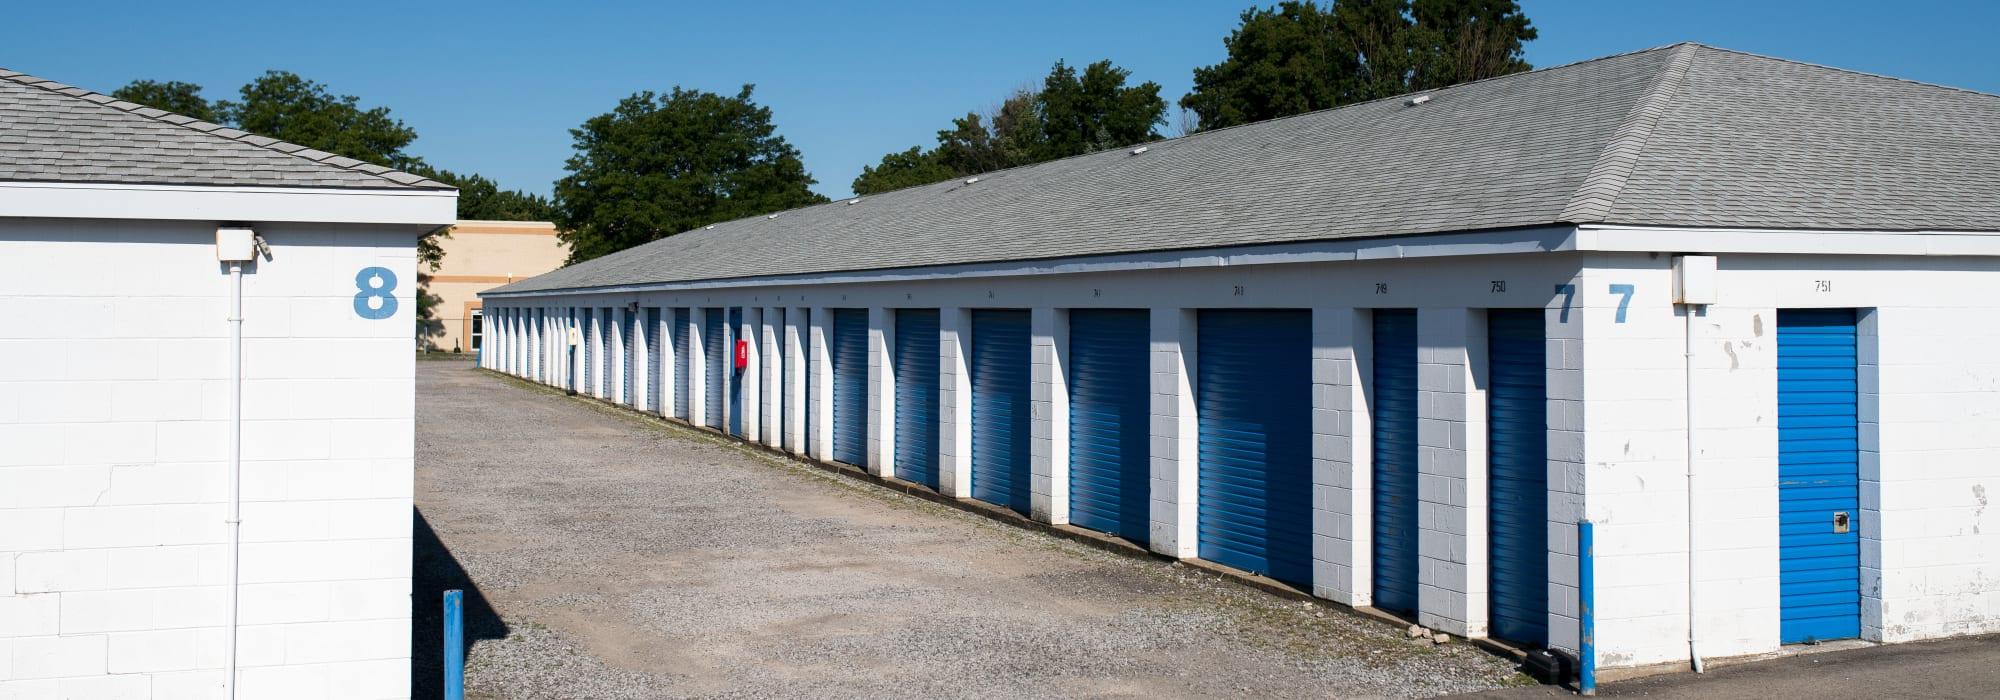 Storage units at Apple Self Storage - Niagara Falls - Kent